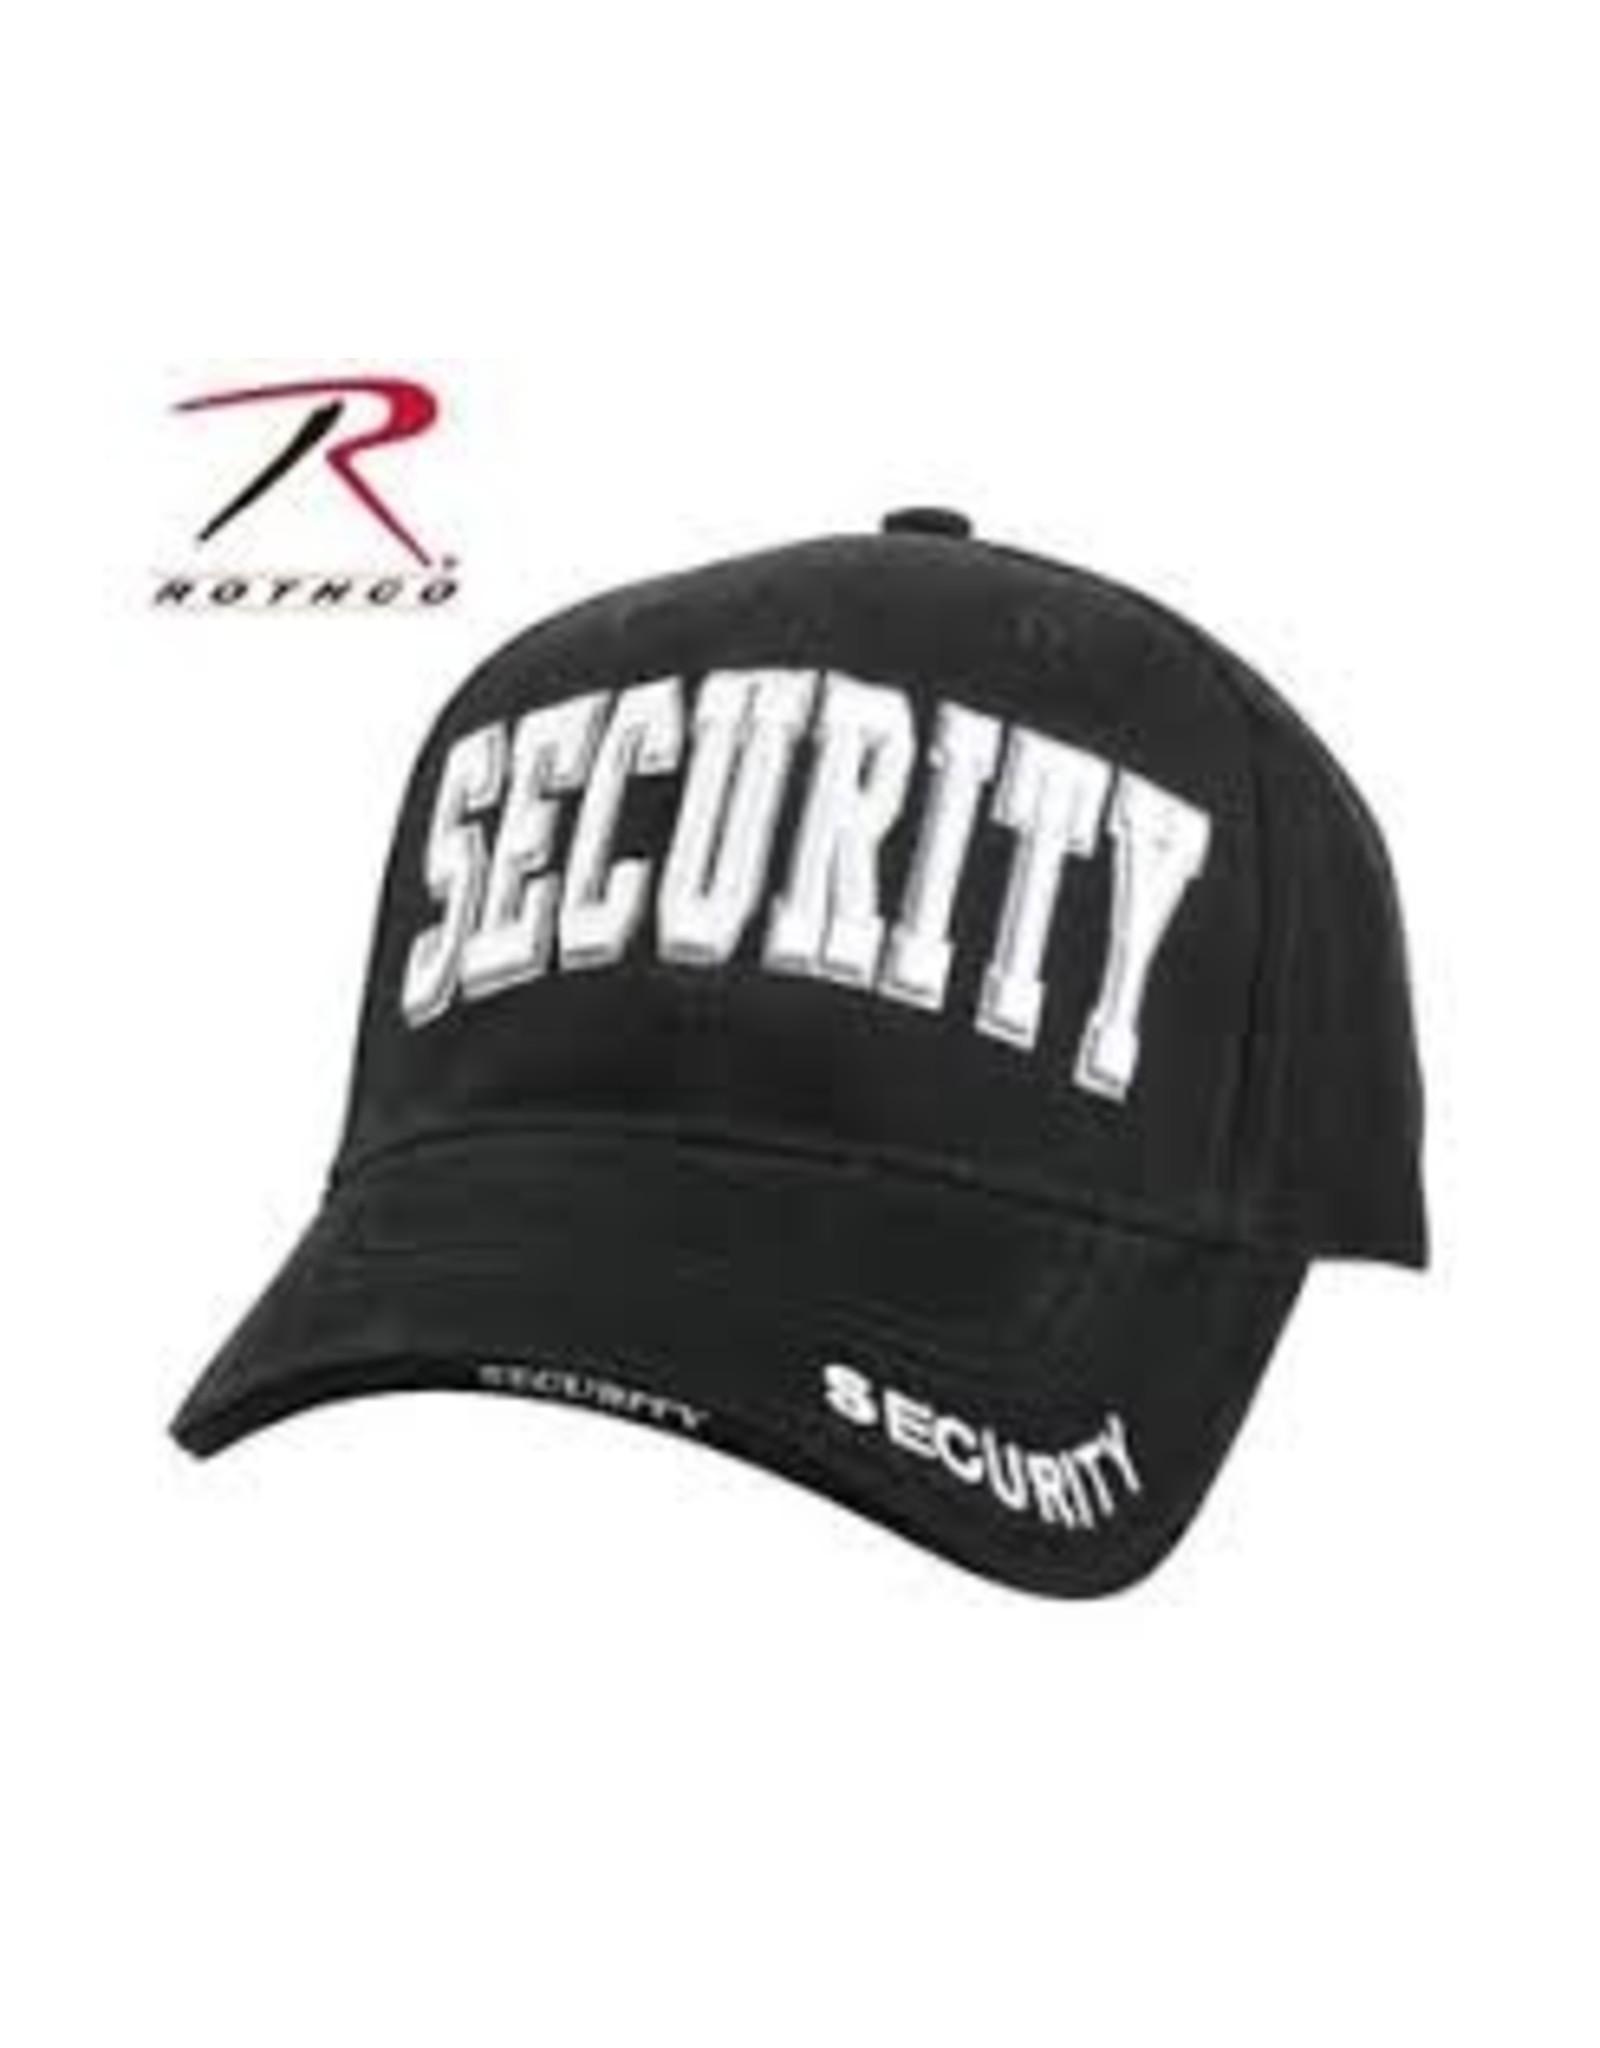 ROTHCO SECURITY Baseball cap - BLACK/WHITE